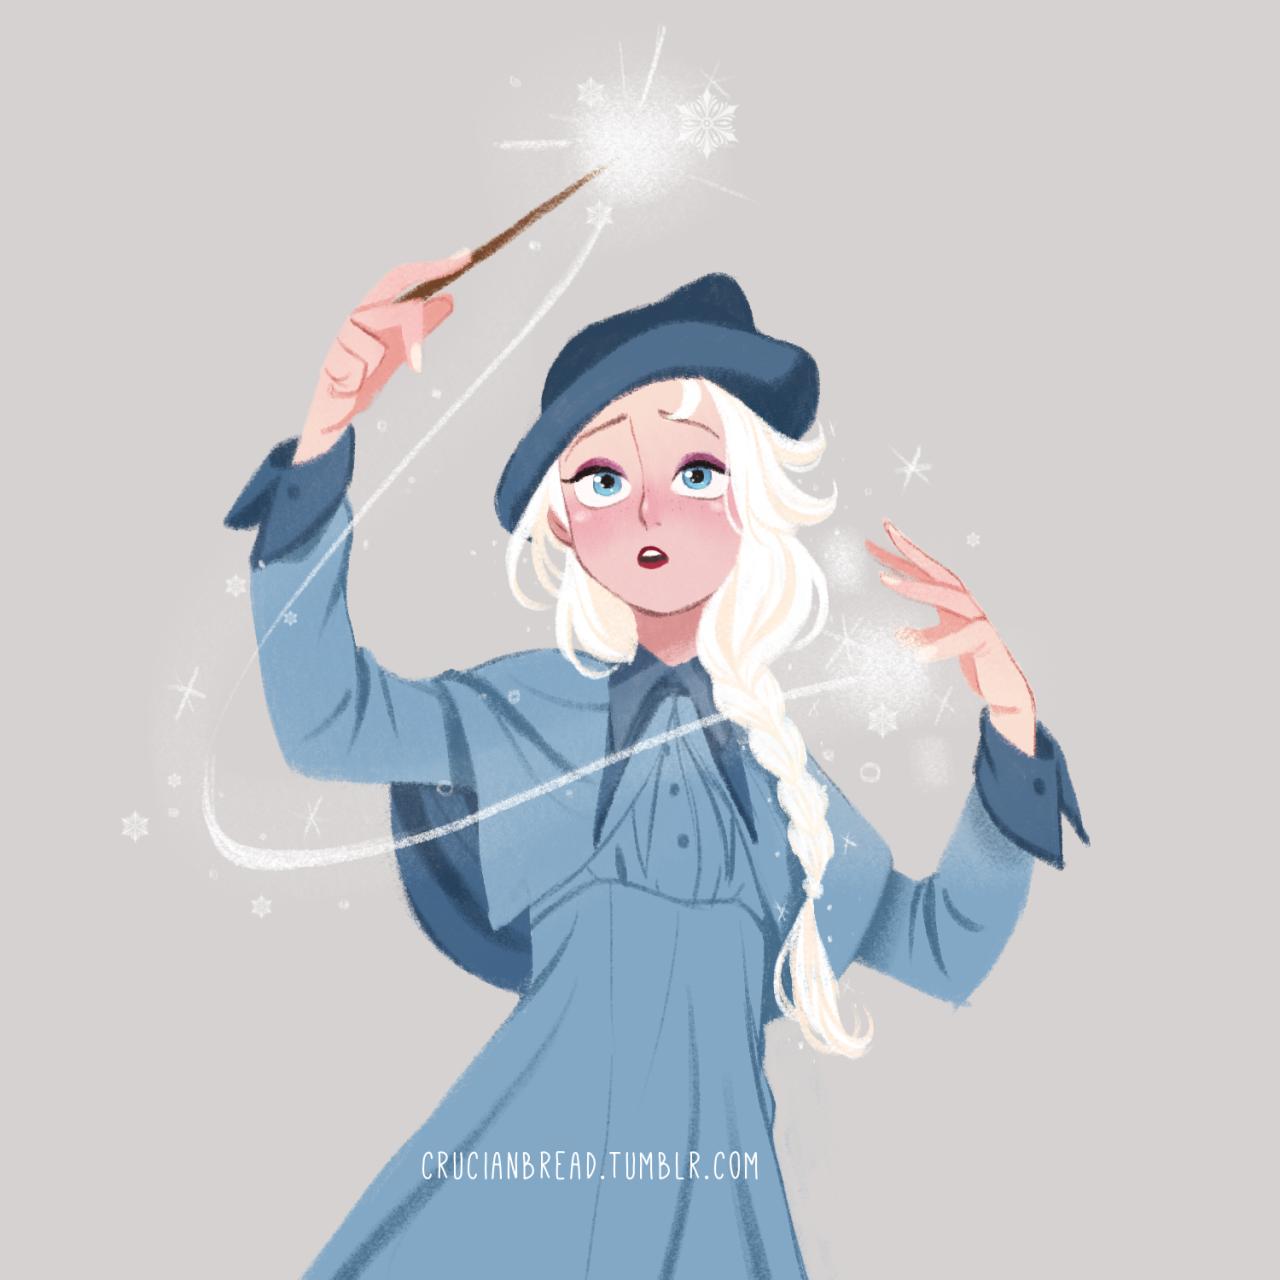 Elsa by Hyanglim Kim [©2016]